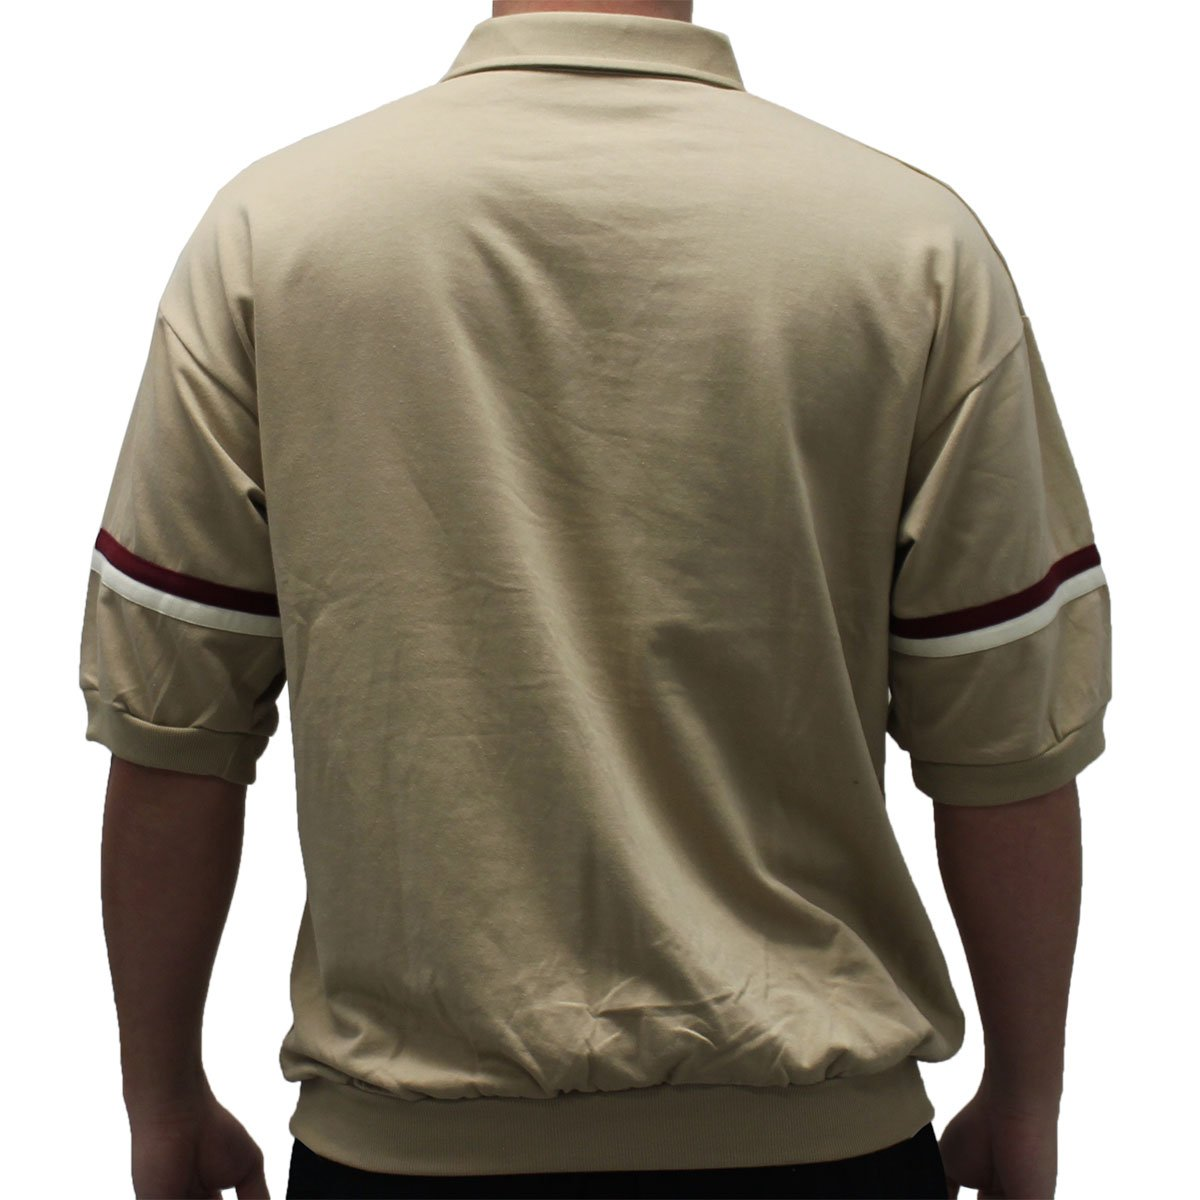 Banded Bottom Classics by Palmland S//S Horizontal Shirt 6090-622J